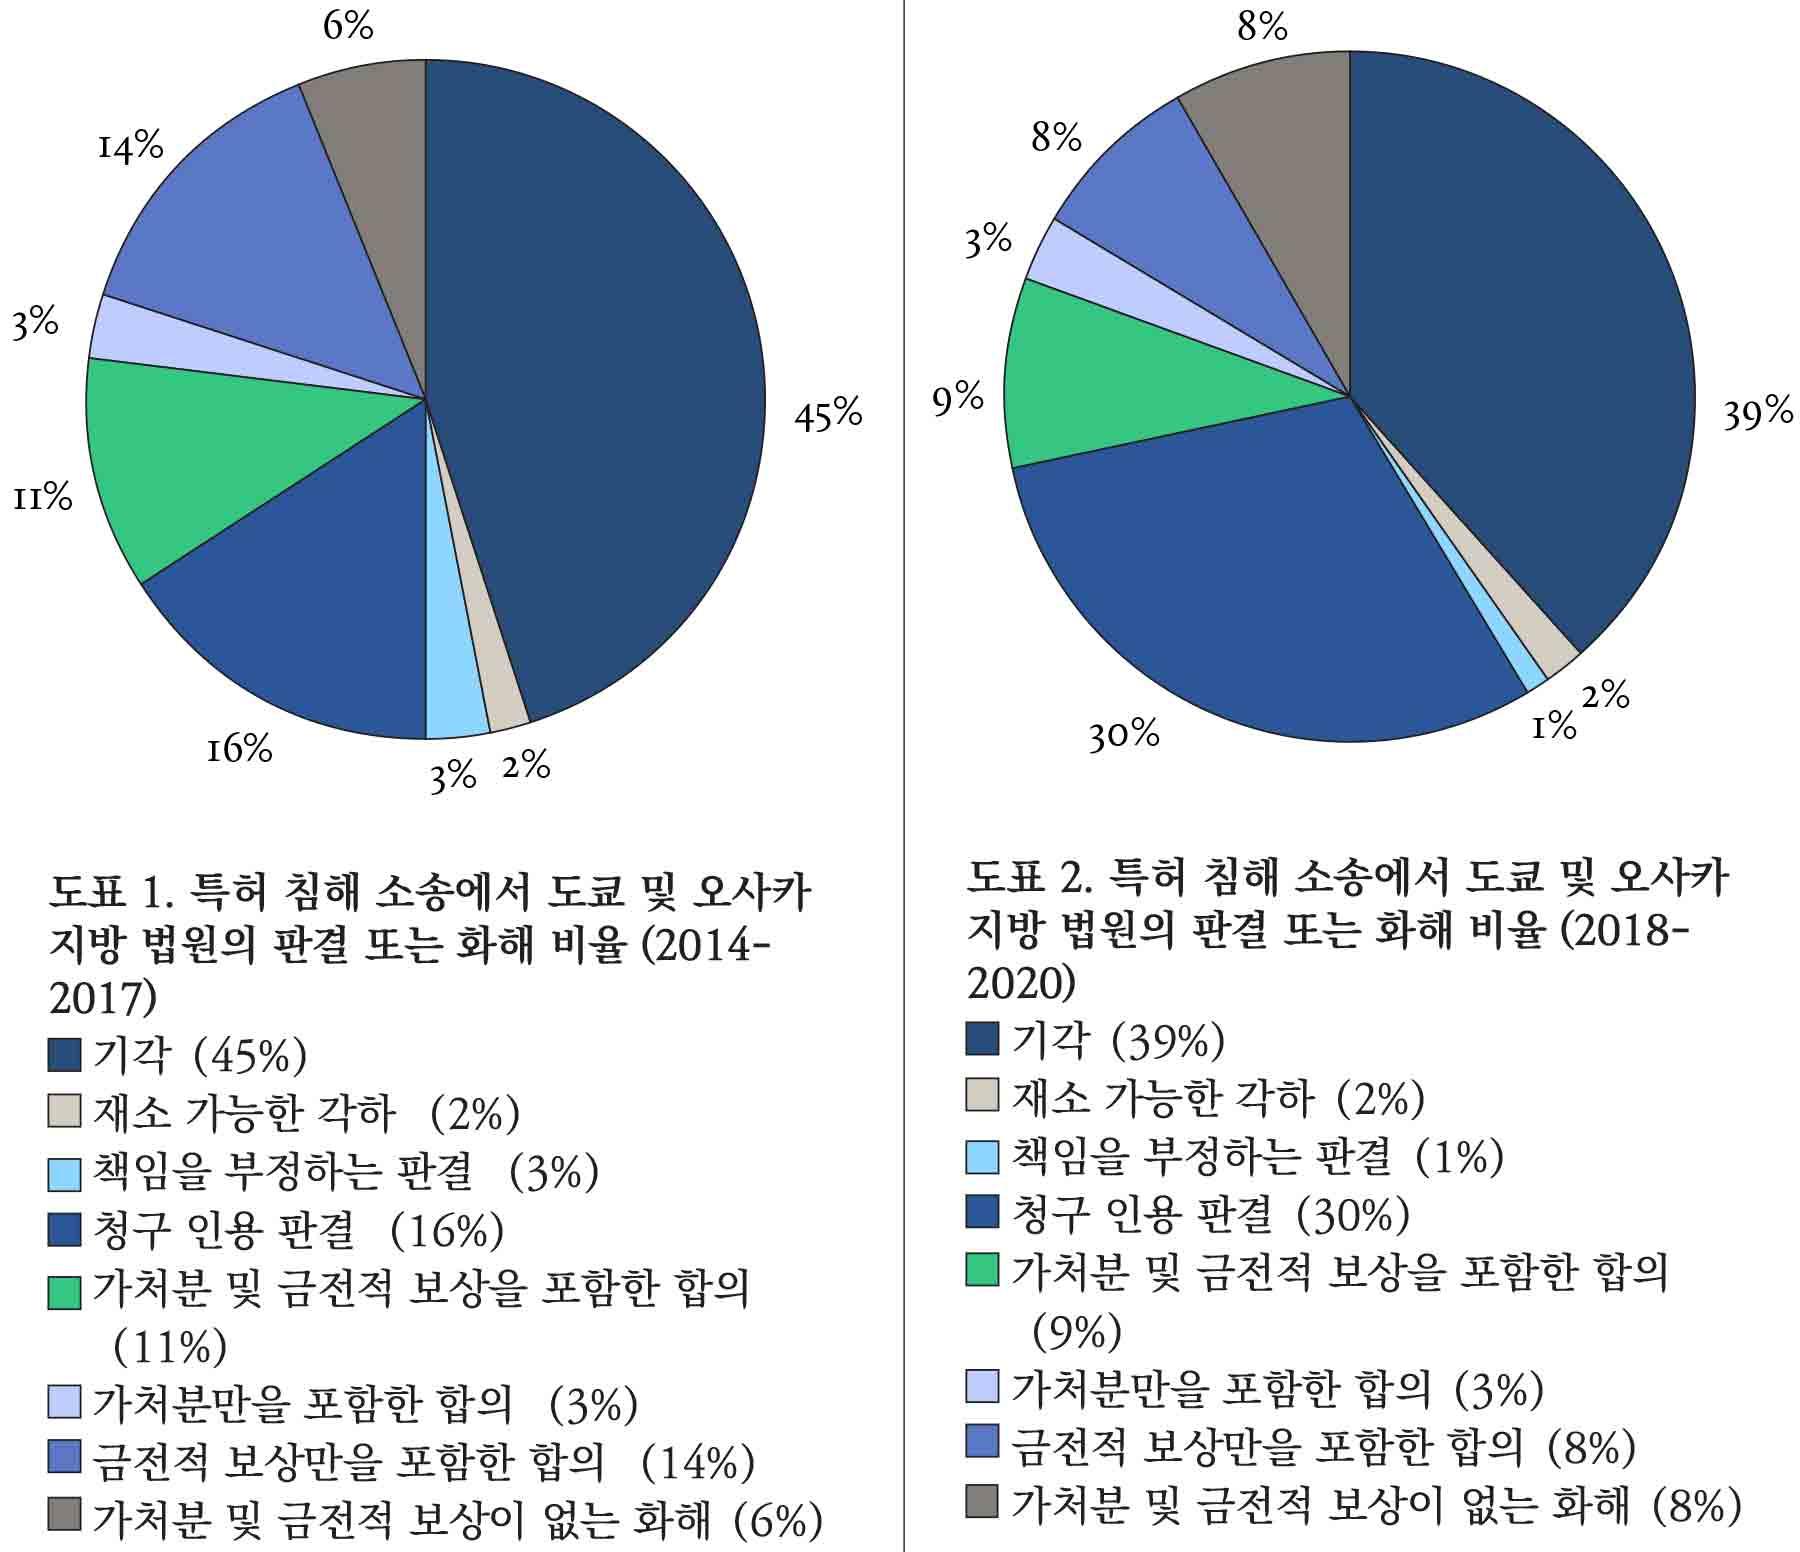 A-COMPARISON-OF-OF-PATENT-LAW-DEVELOPMENT-各国专利法发展对比-Chart-1-2-Kr